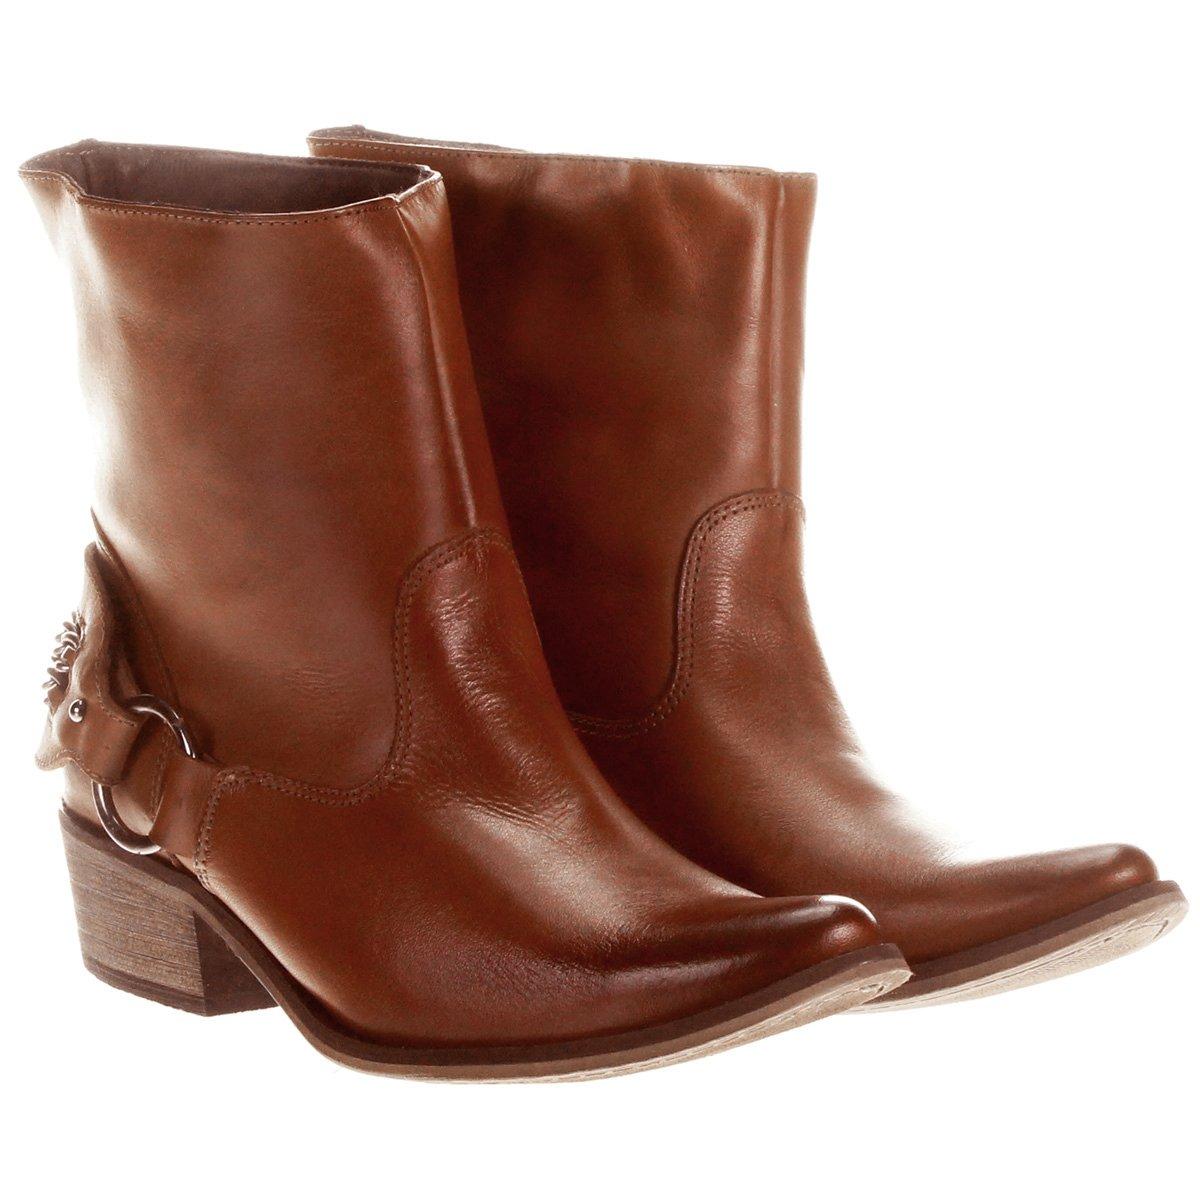 74f5530dae Bota My Shoes Correntes Cano Curto .